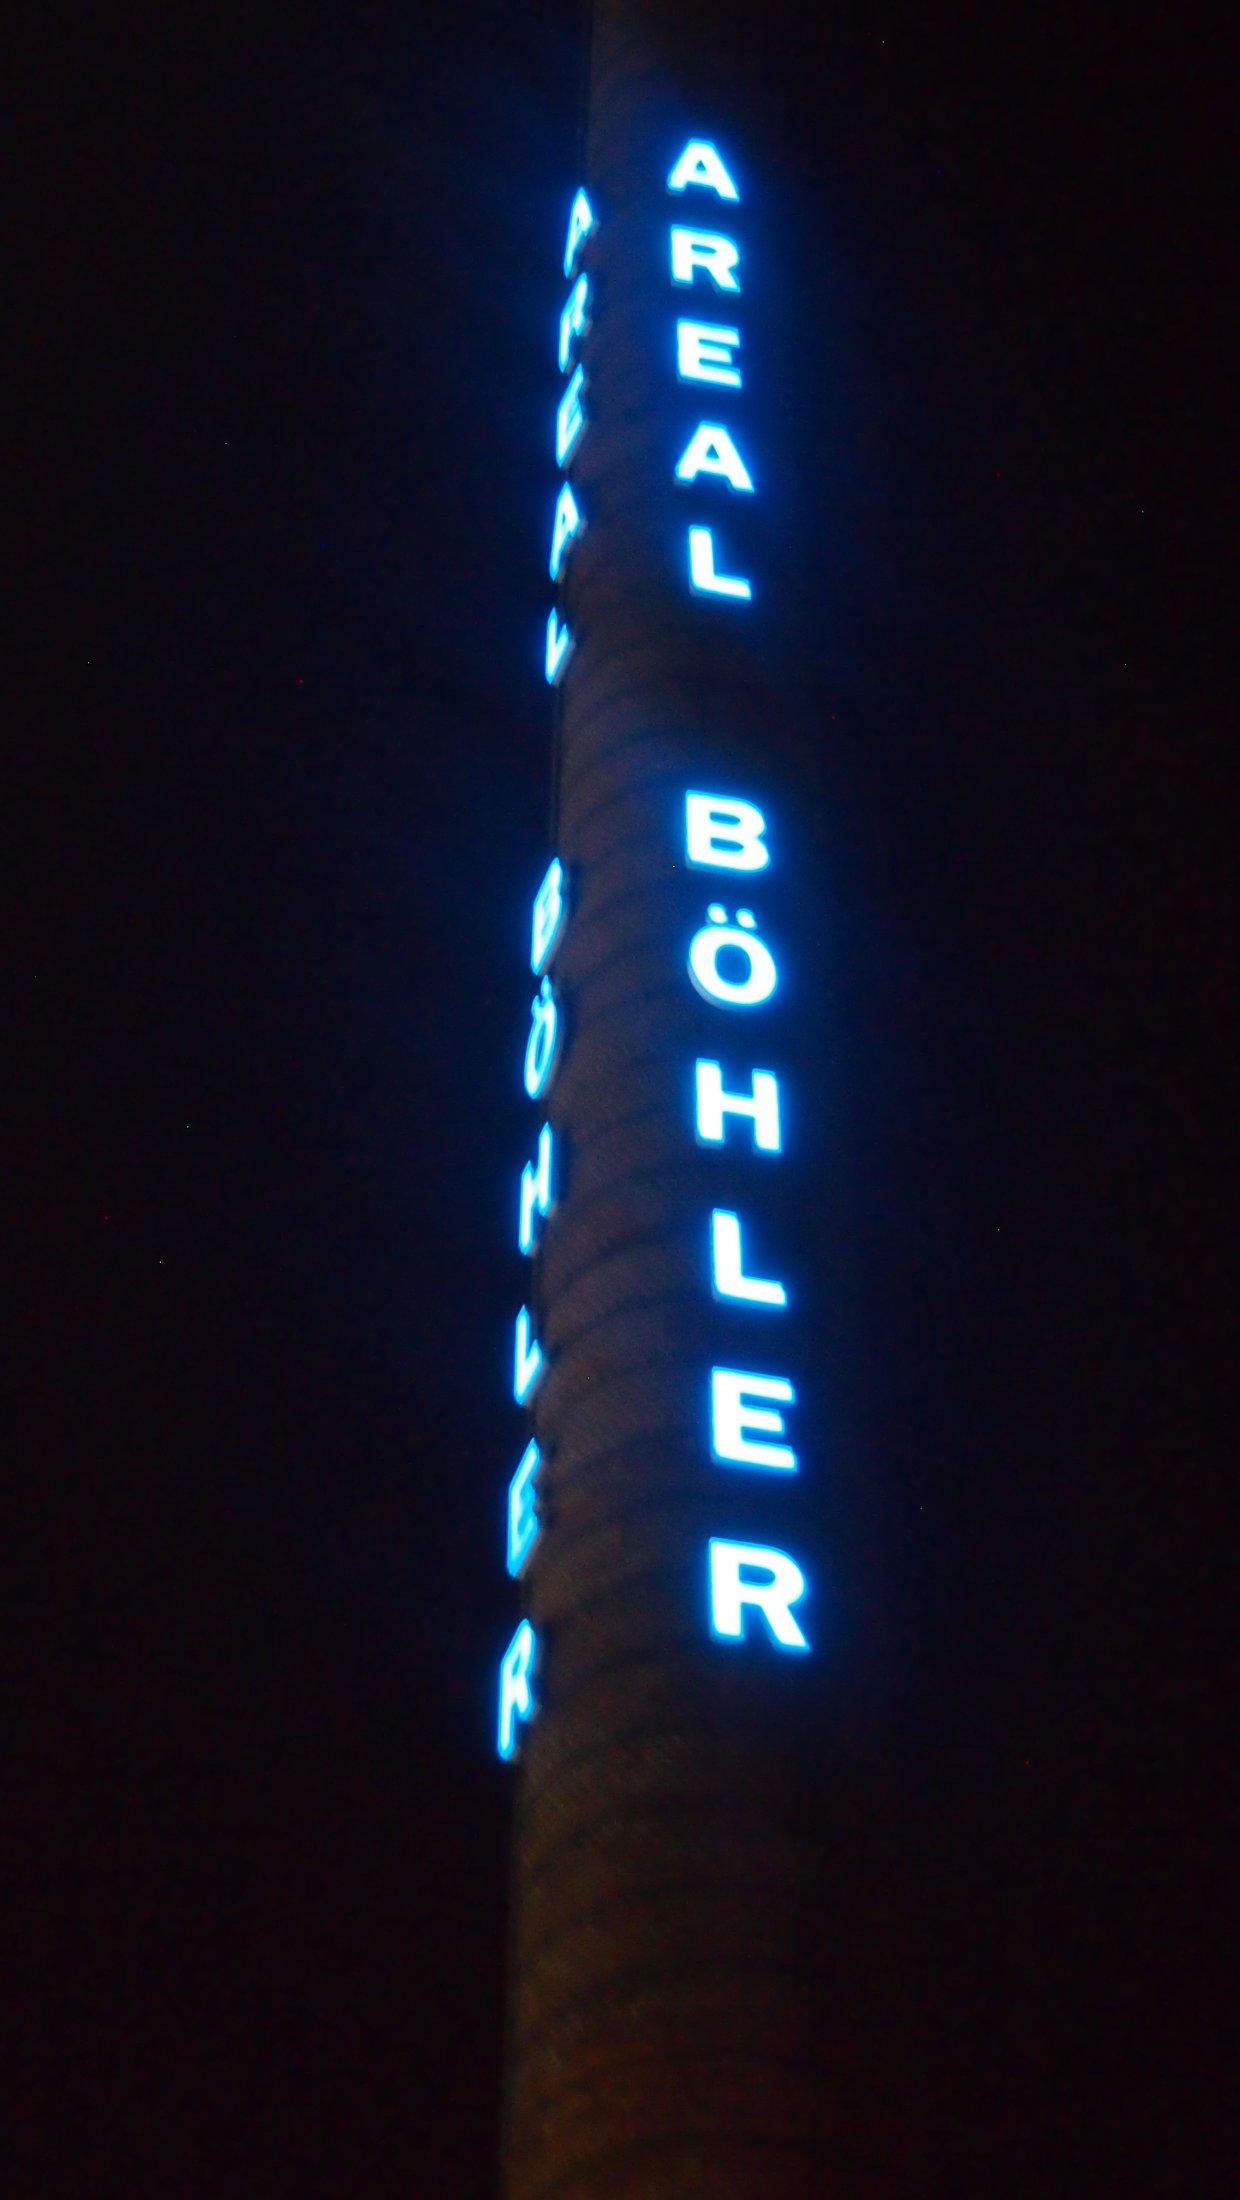 Areal Böhler